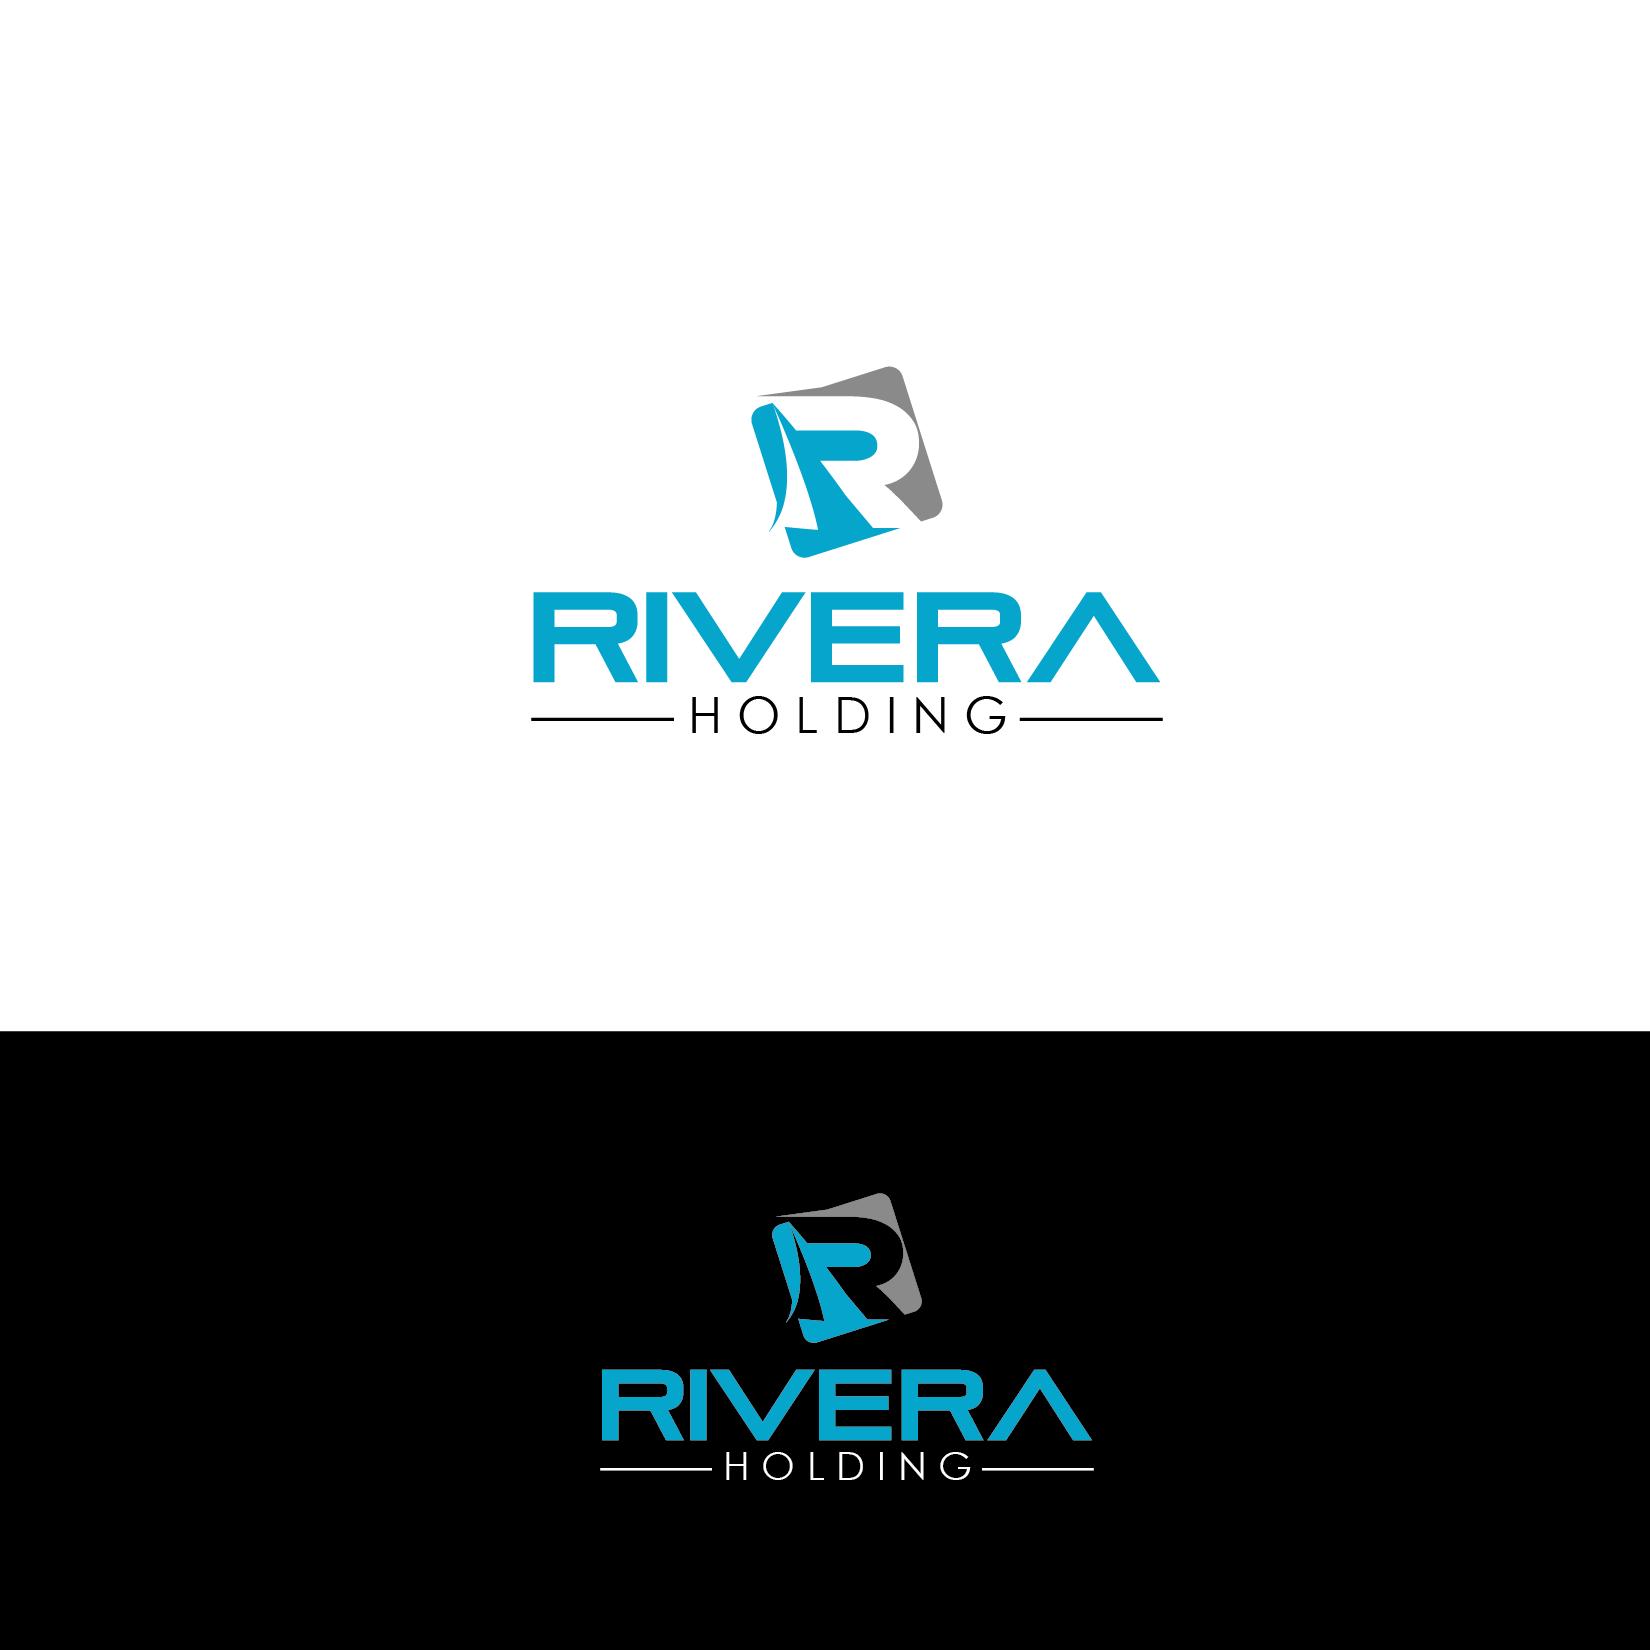 Logo Design by Private User - Entry No. 76 in the Logo Design Contest RIVERA HOLDING Logo Design.